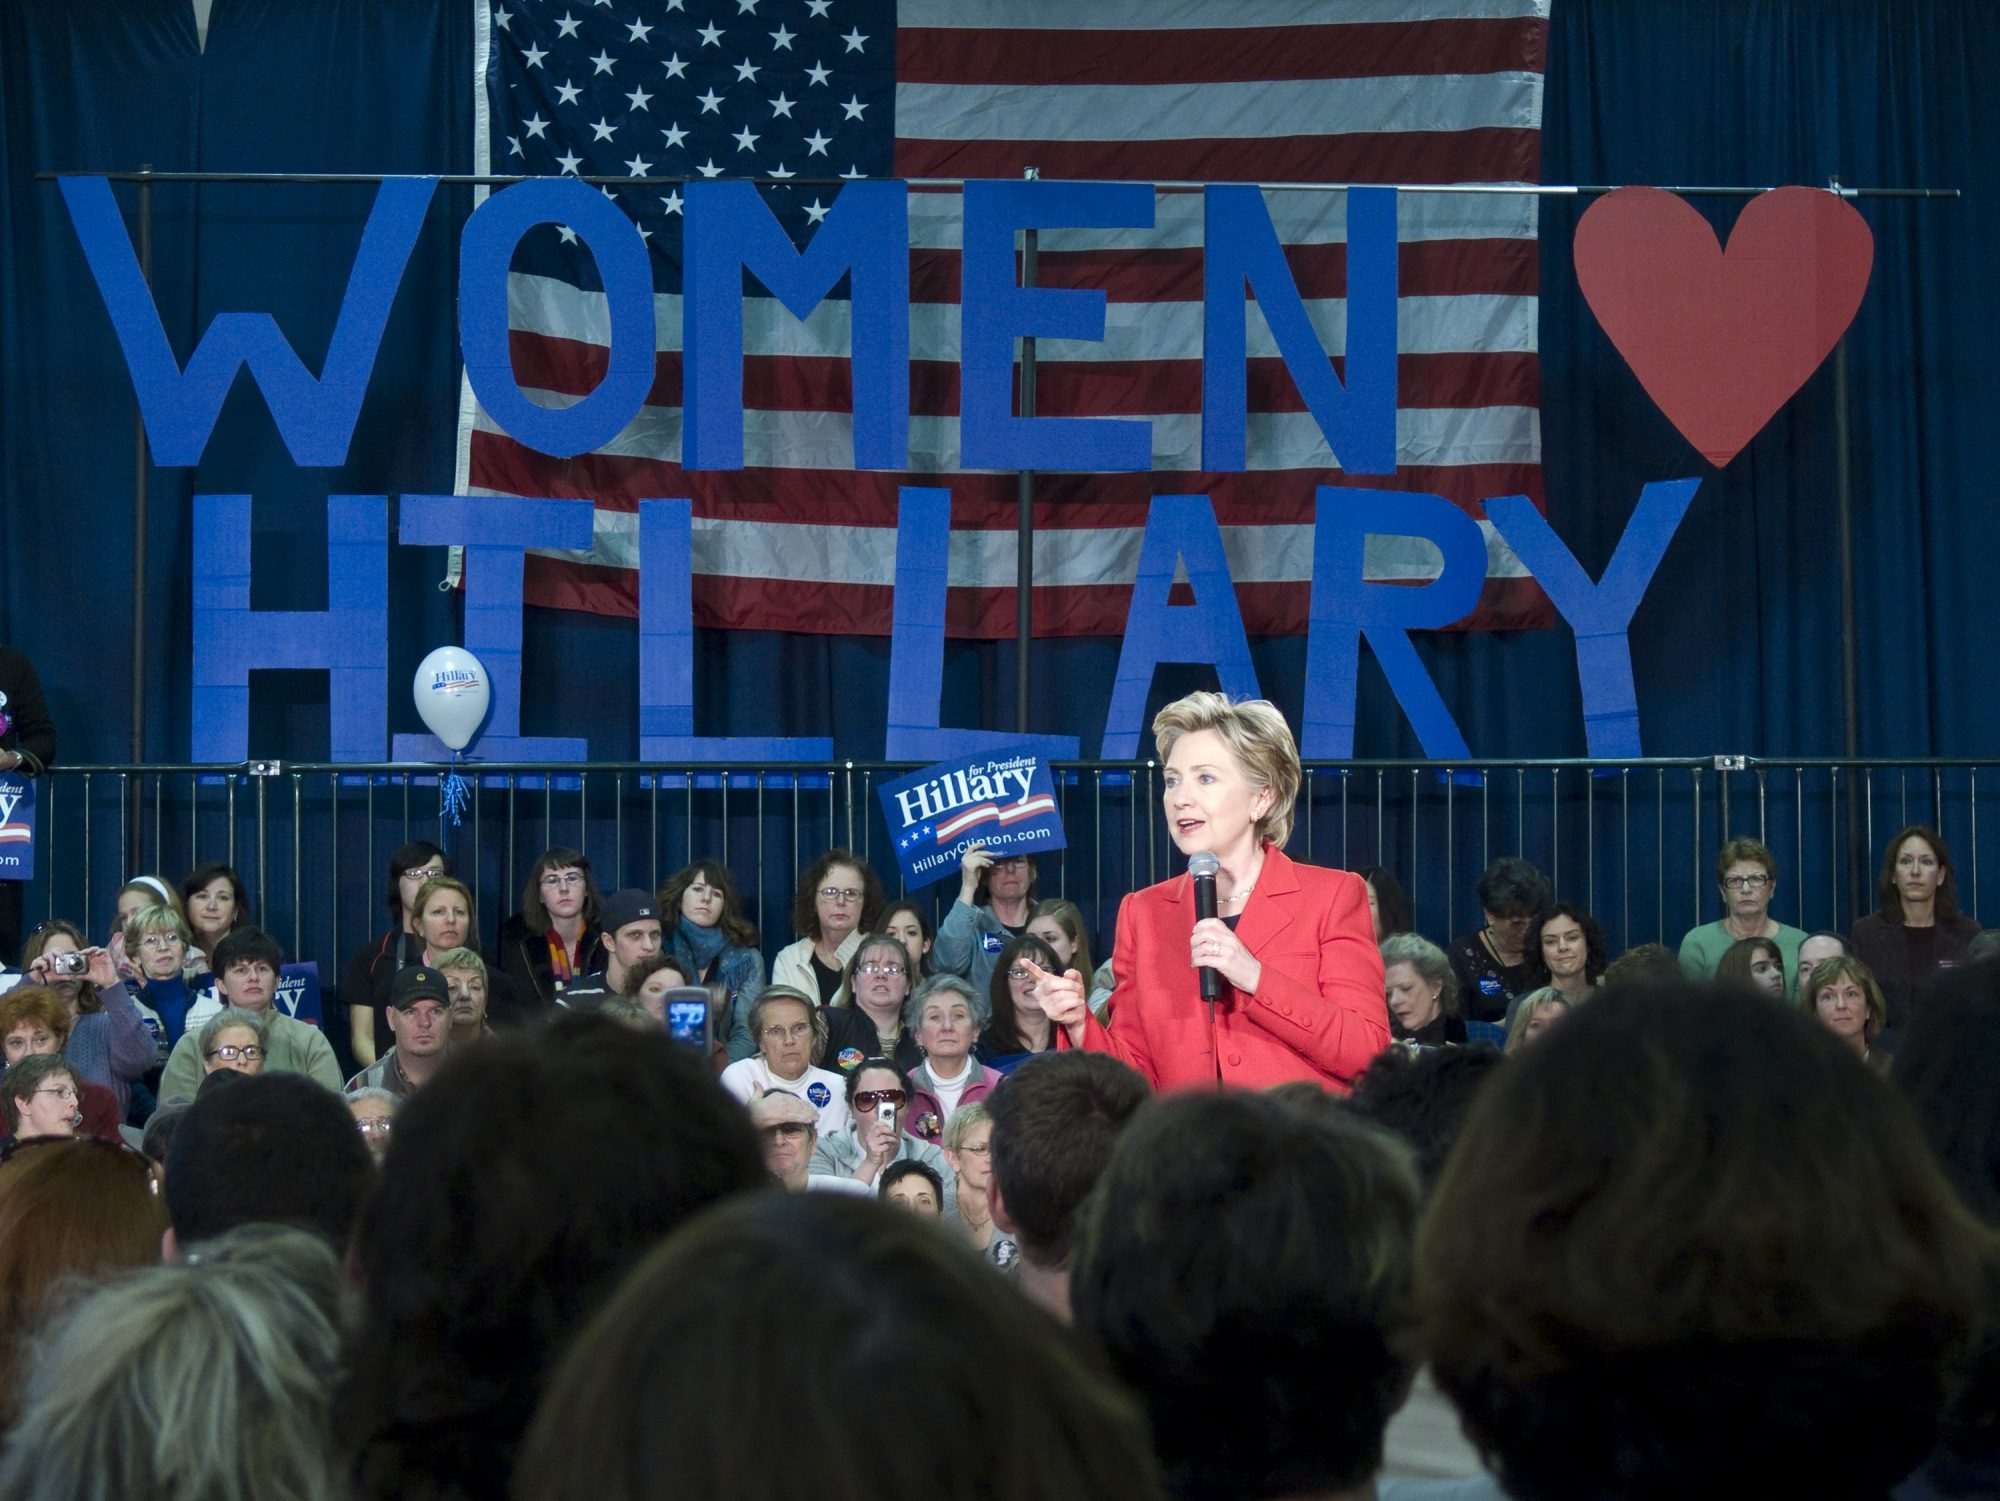 hillary-clinton-campaign.jpg